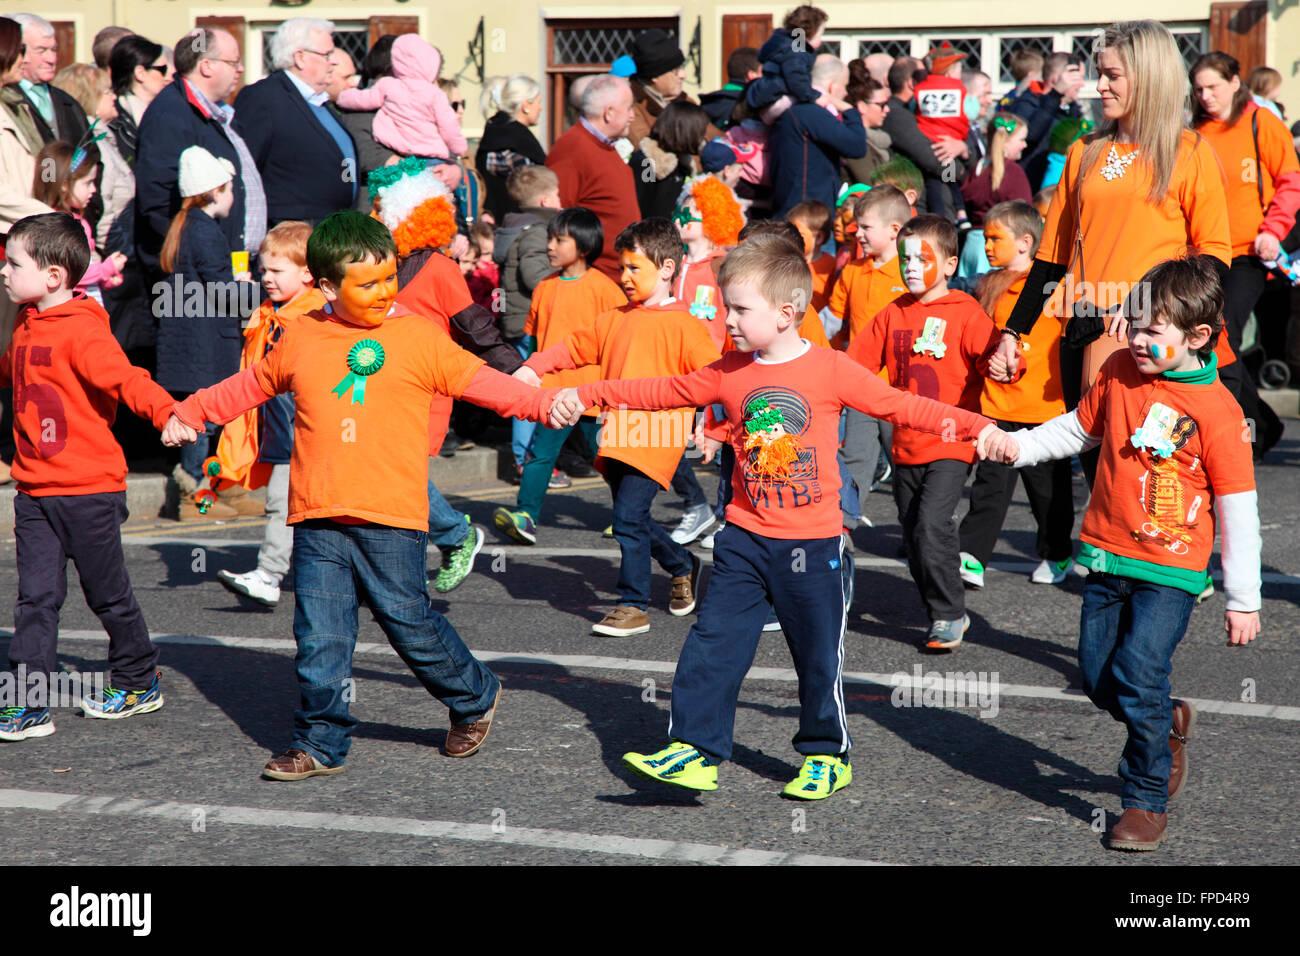 Primary School children in Carrickmacross St Patricks Day Parade - Stock Image